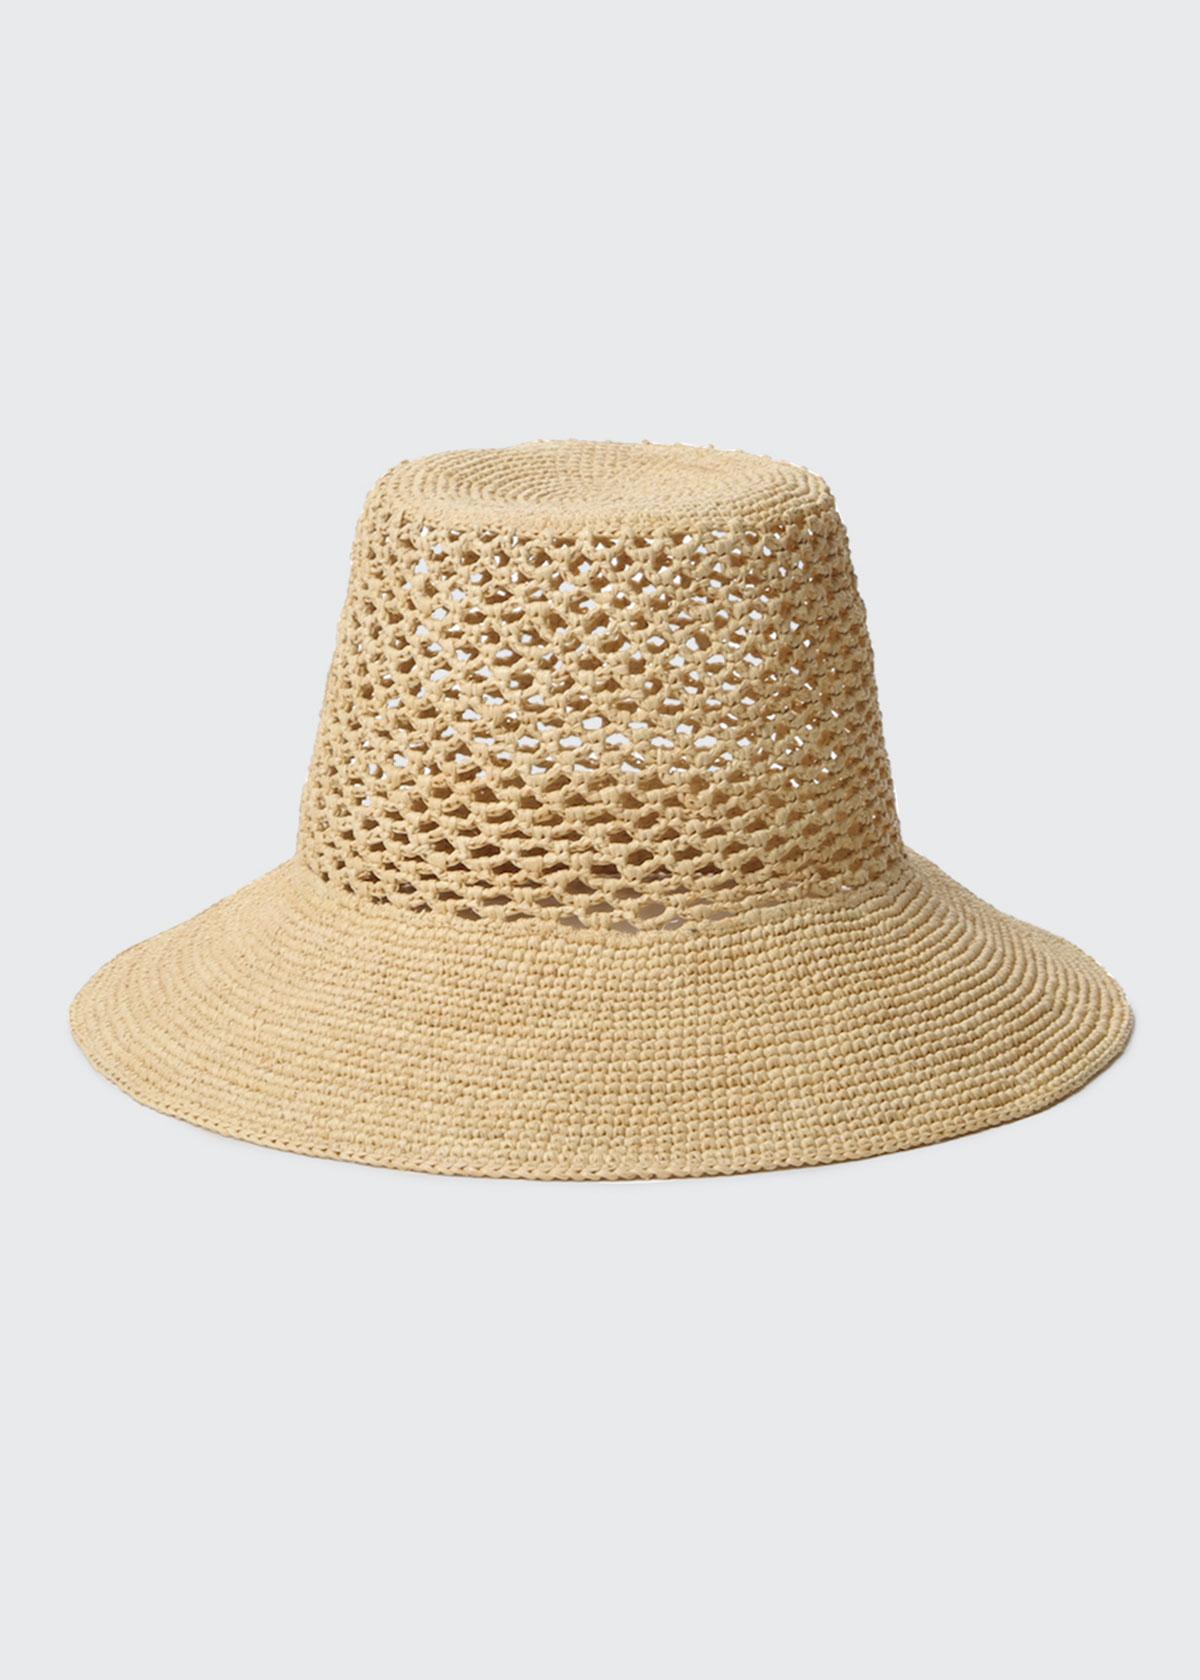 Janessa Leone LYNDA WOVEN STRAW BUCKET HAT